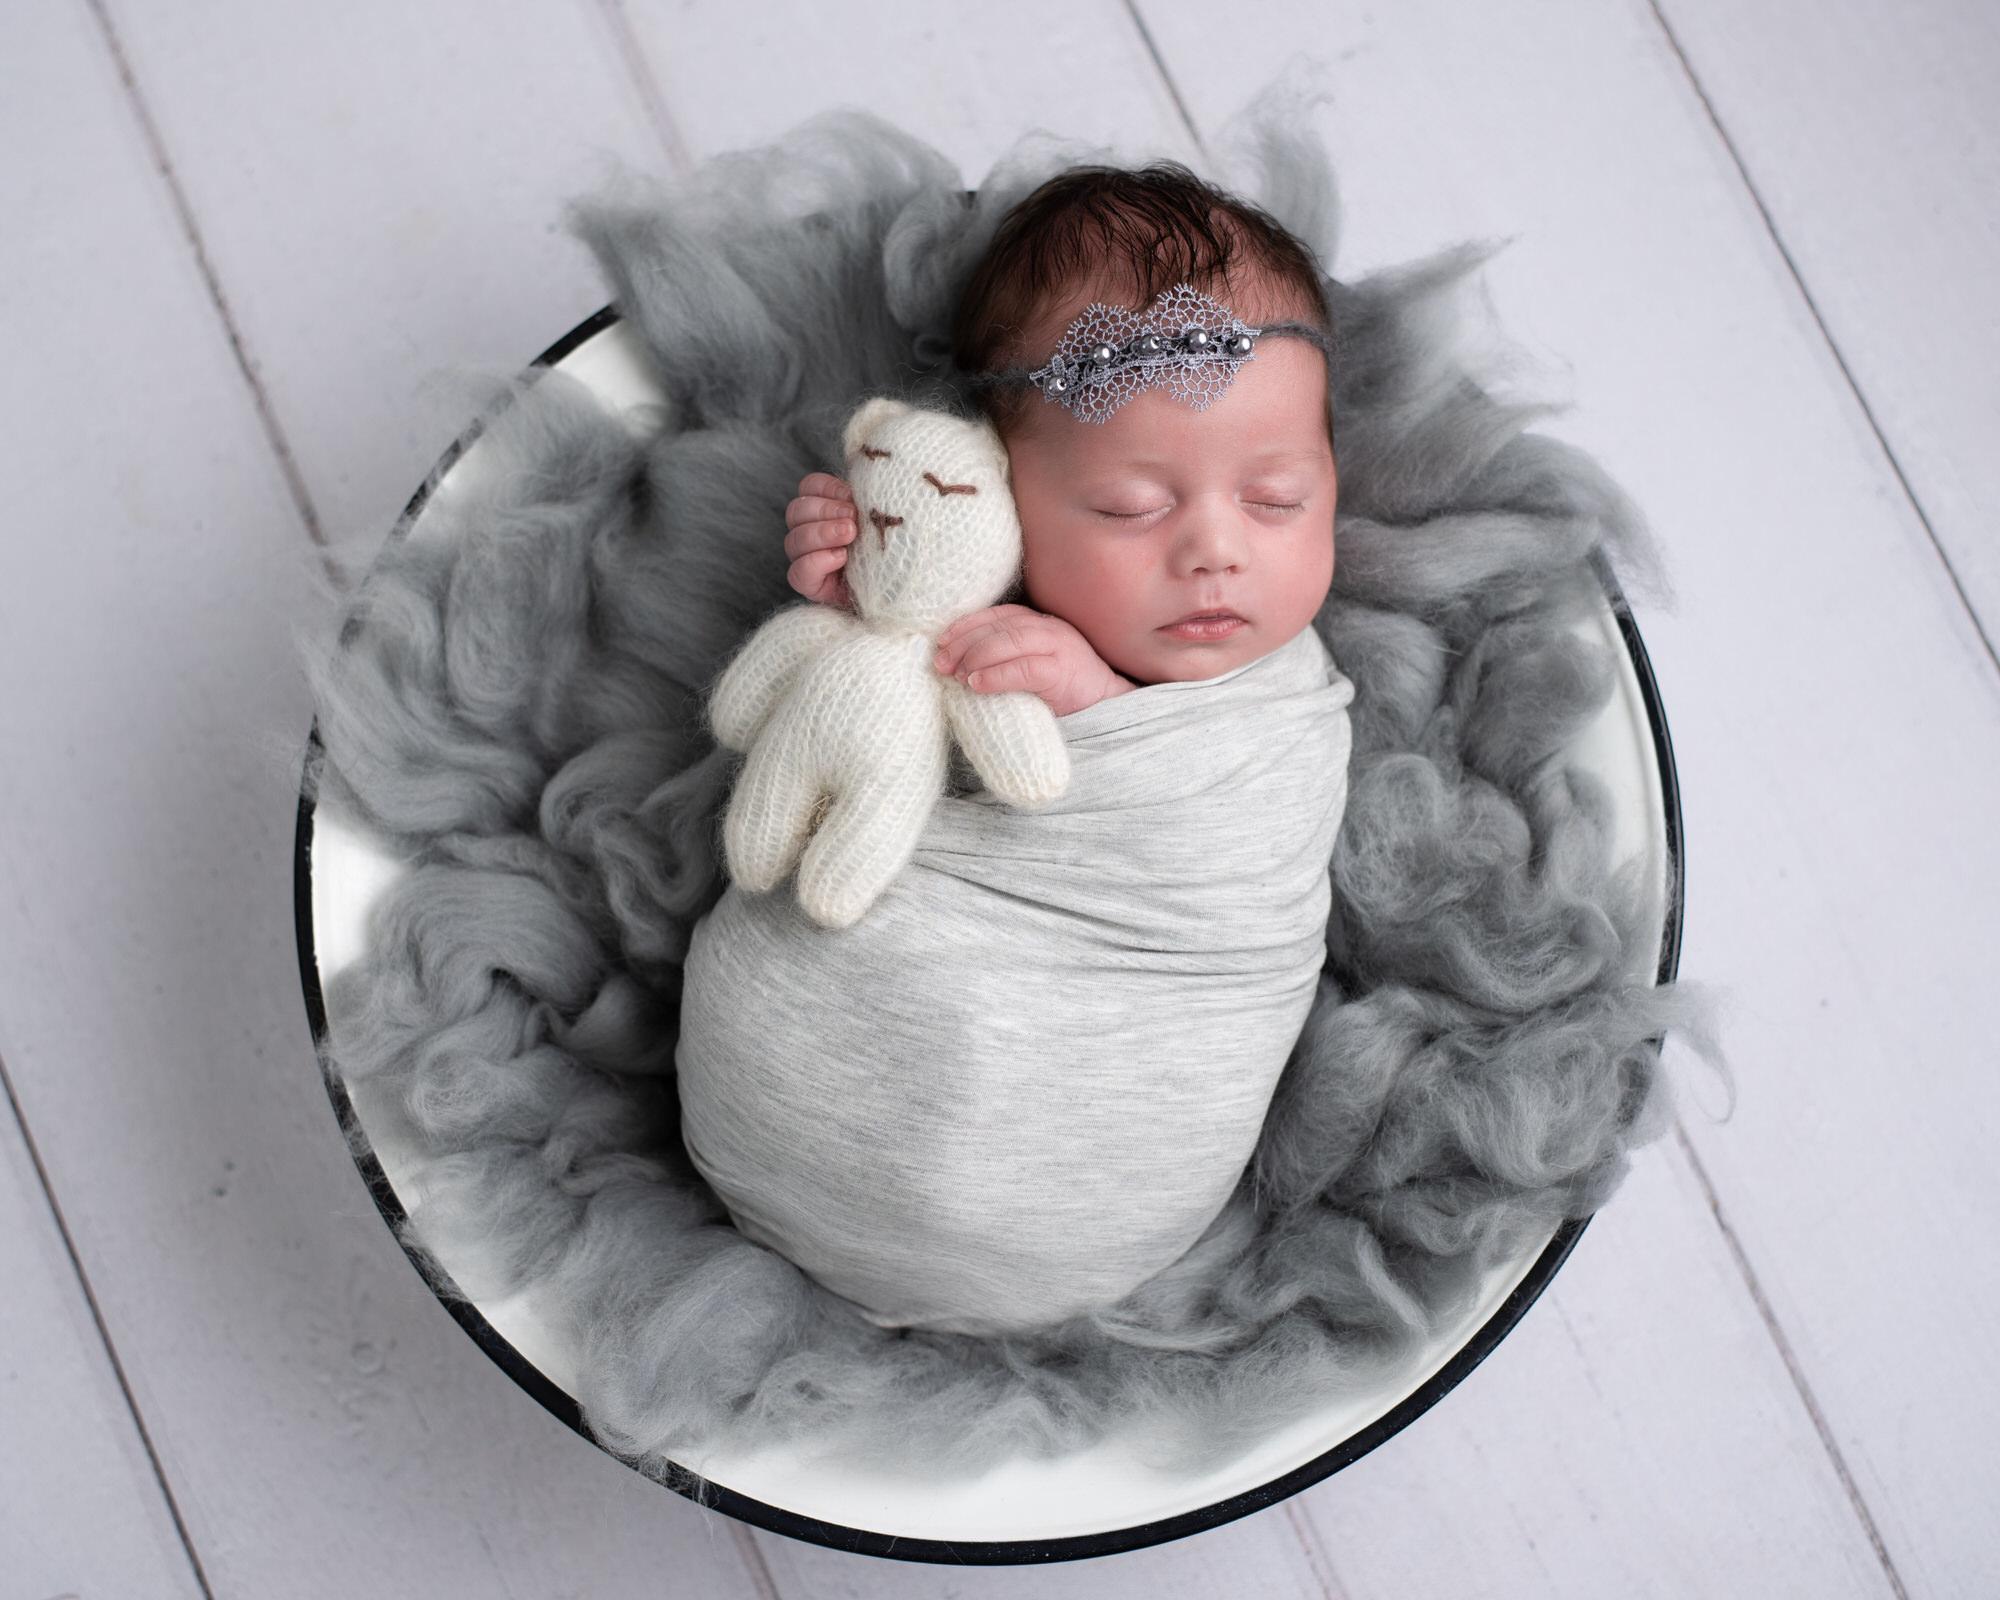 Newborn_baby_photographer_dudley_midlands_posing_in_basket